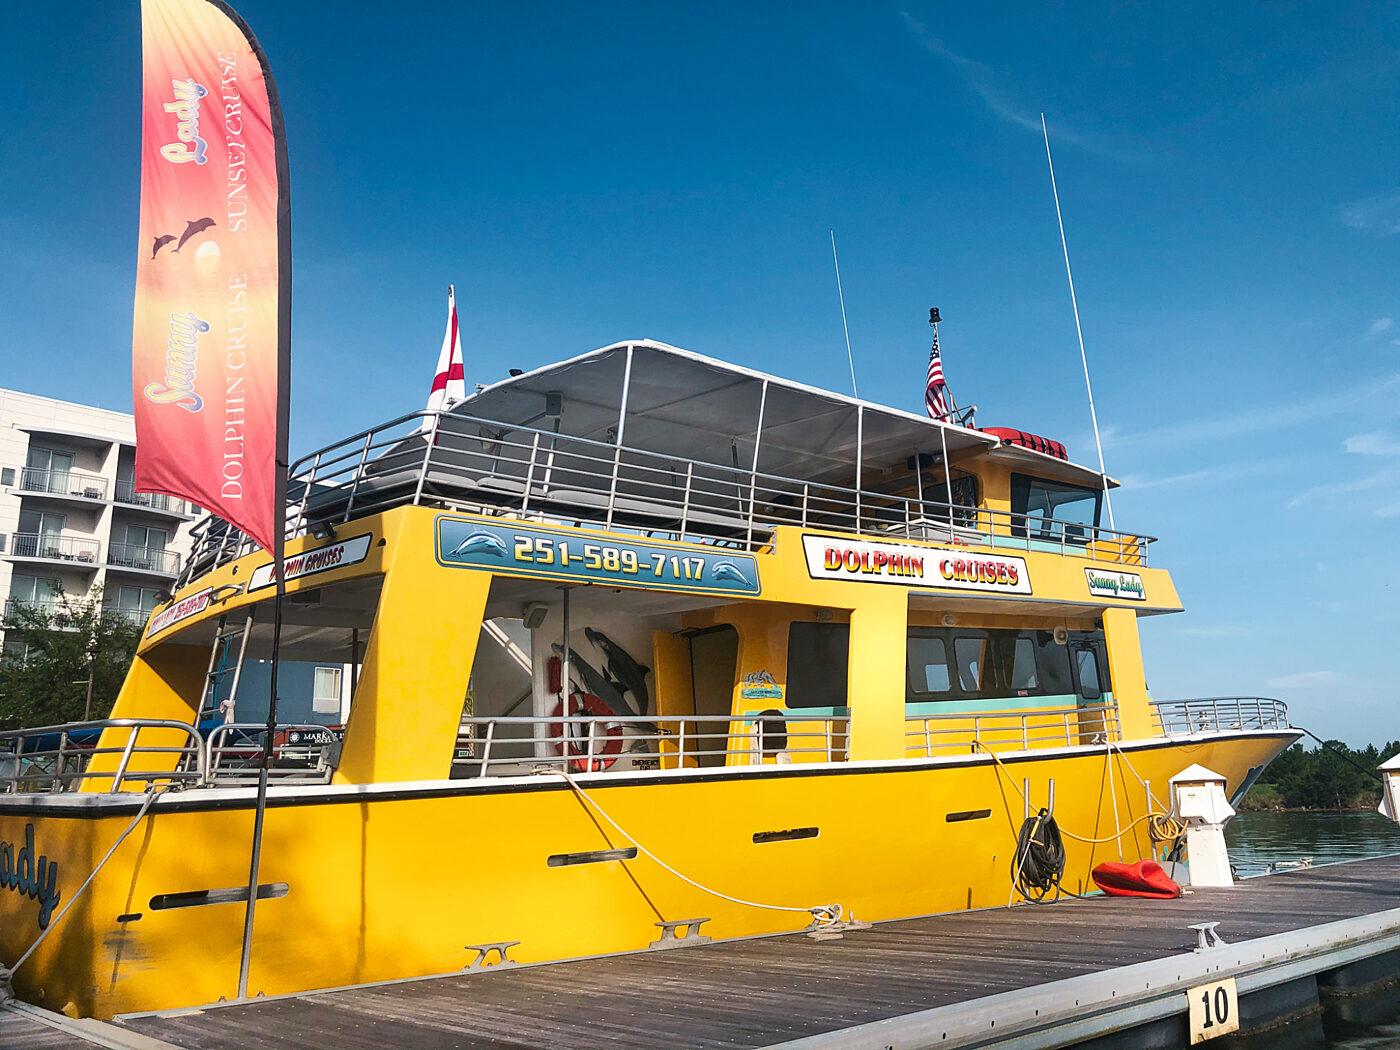 The Wharf Orange Beach Sunny Lady Dolphin Sunset Cruise